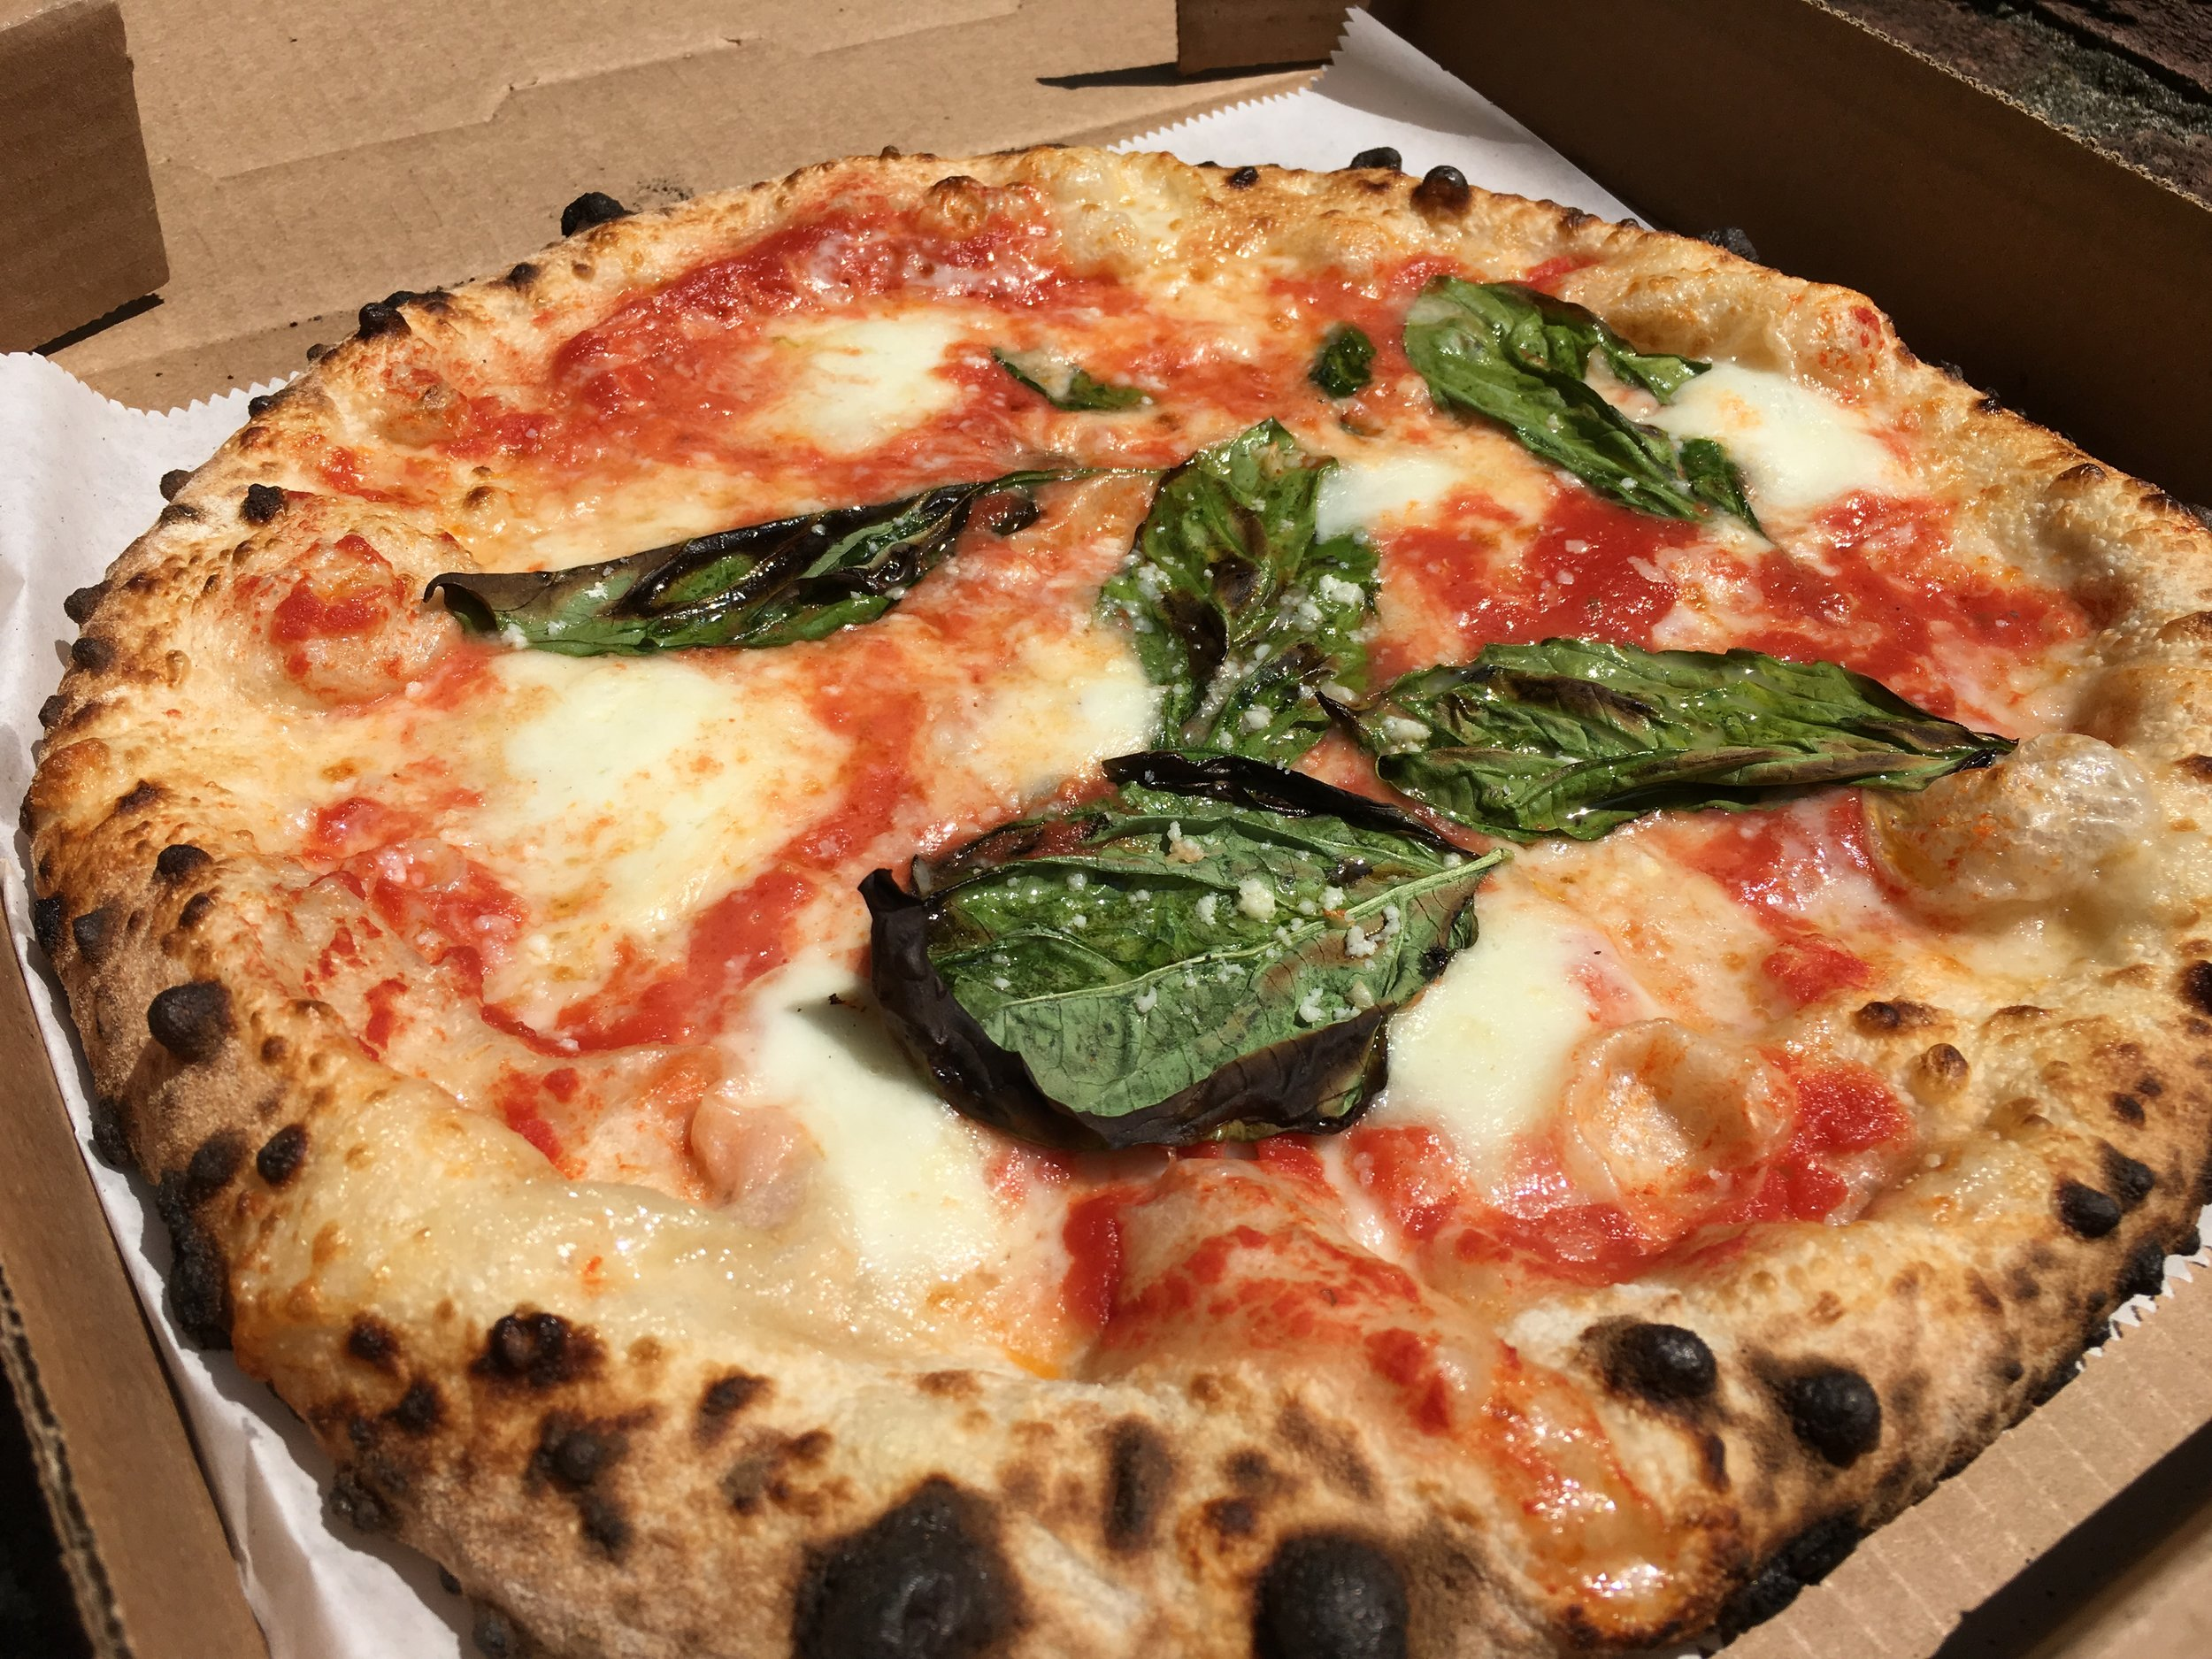 MARGHERITA - San Marzano tomato sauce, Buffalo Mozzarella, basil, garlic, Pecorino